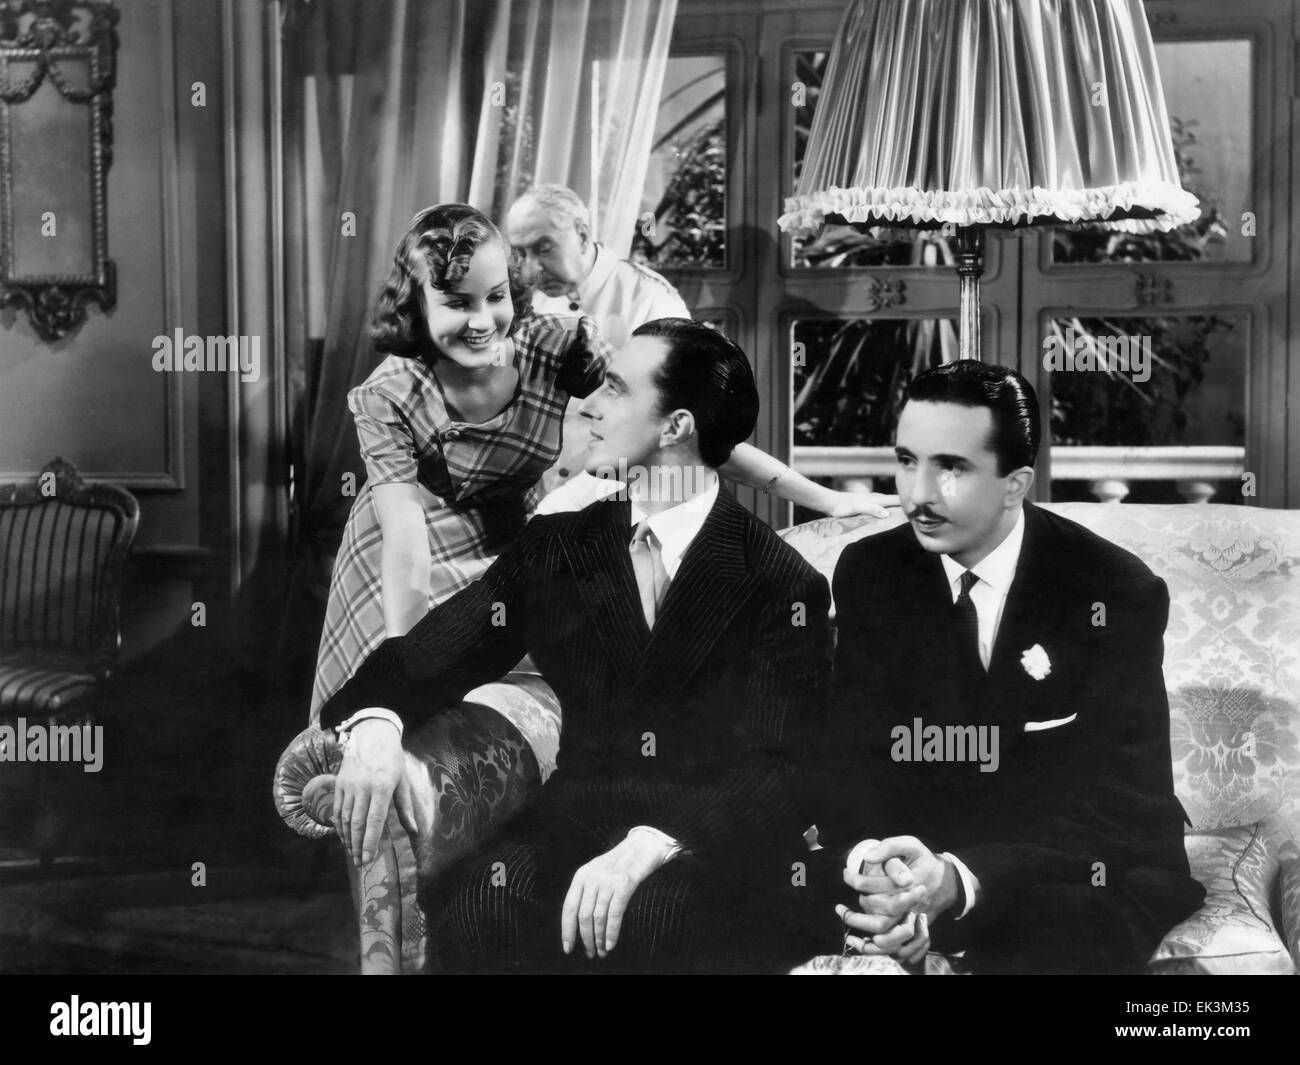 Vittorio De Sica, (center), on-set of the Film 'Do You Like Women' (aka Teresa Venerdi), 1941 - Stock Image